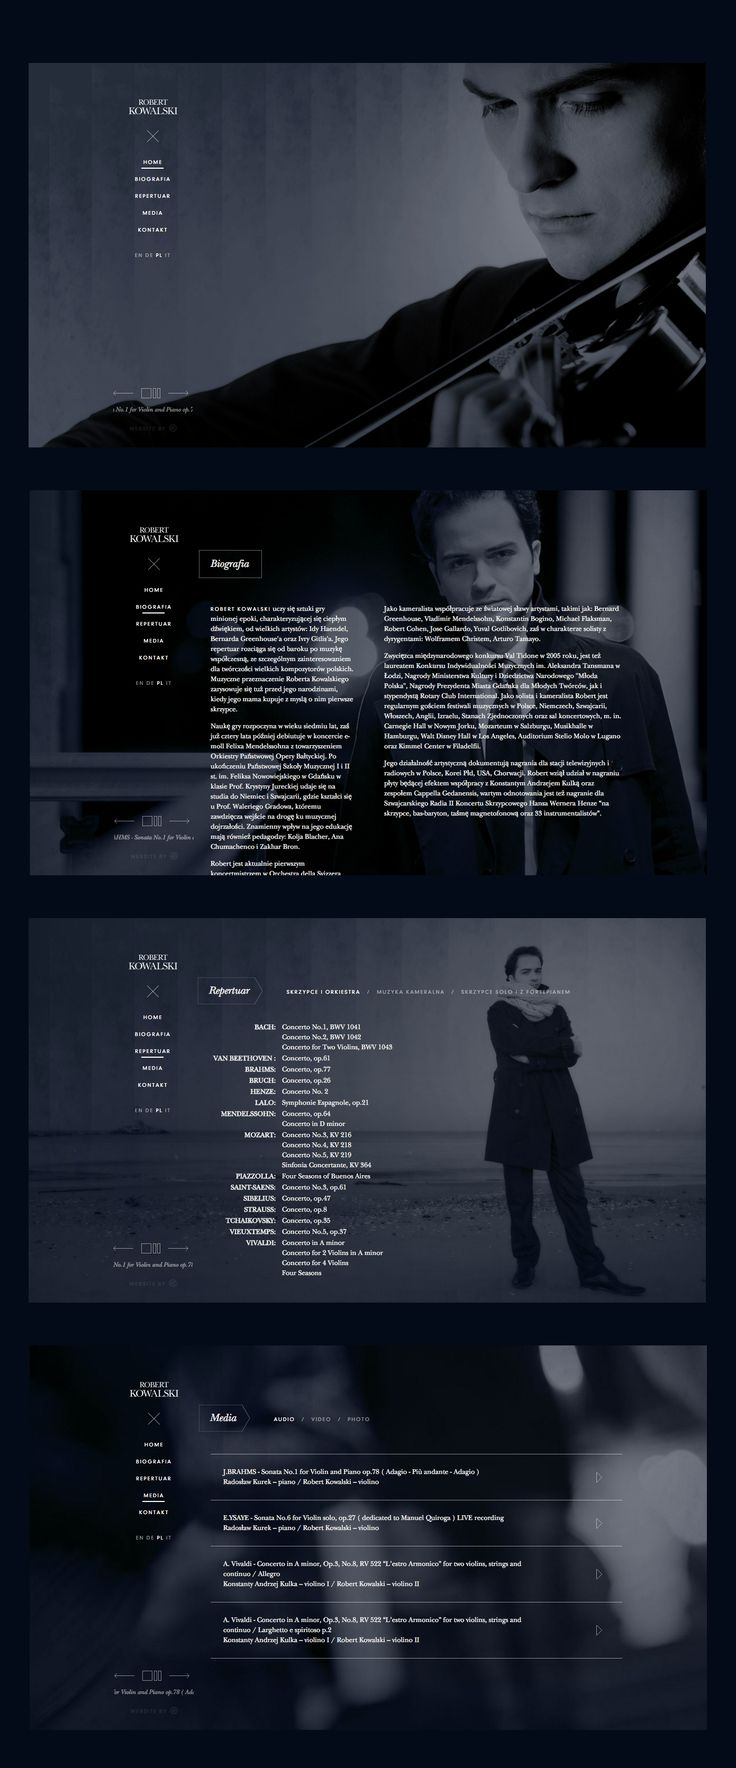 Robert Kowalski Violinist website